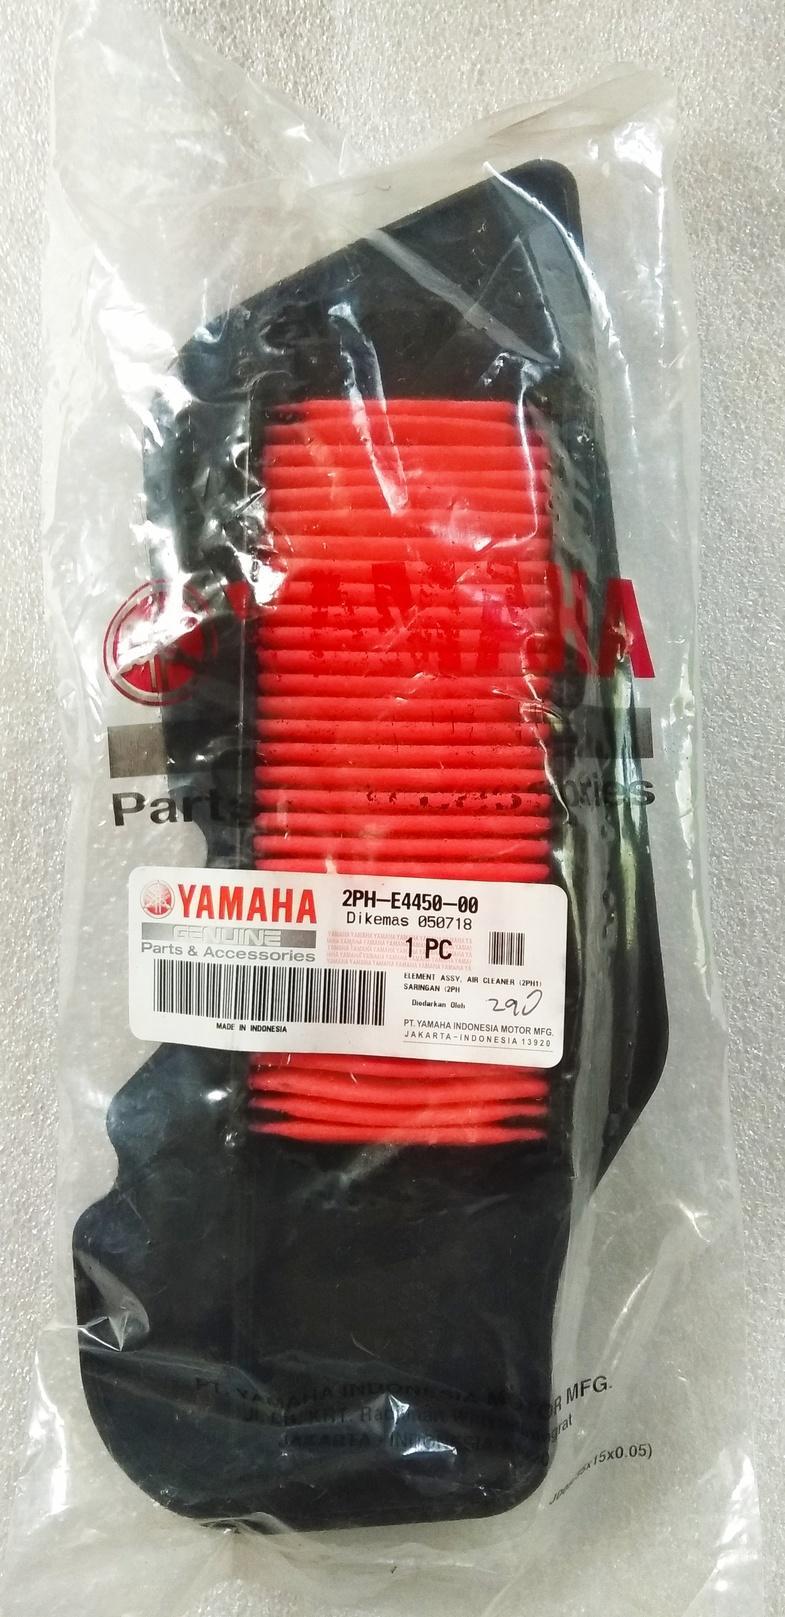 Original Yamaha Air Filter For Mio I M3 125 By Jca Motorshop.